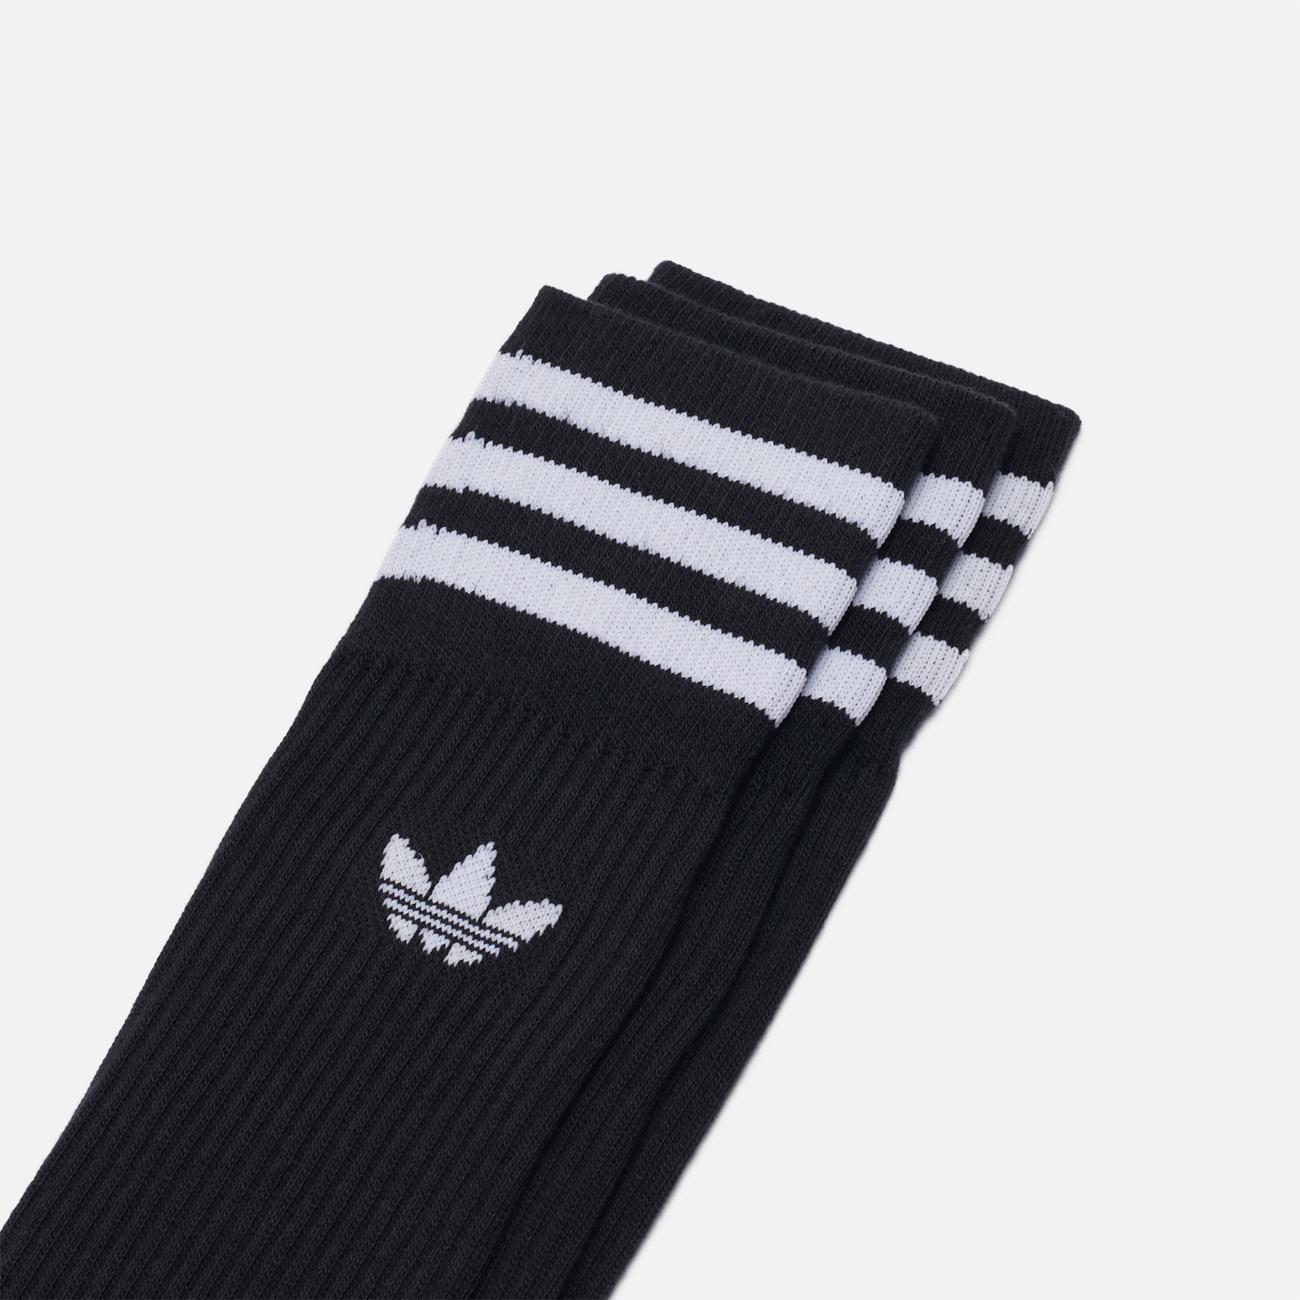 Комплект носков adidas Originals Crew 3 Pairs Black/White